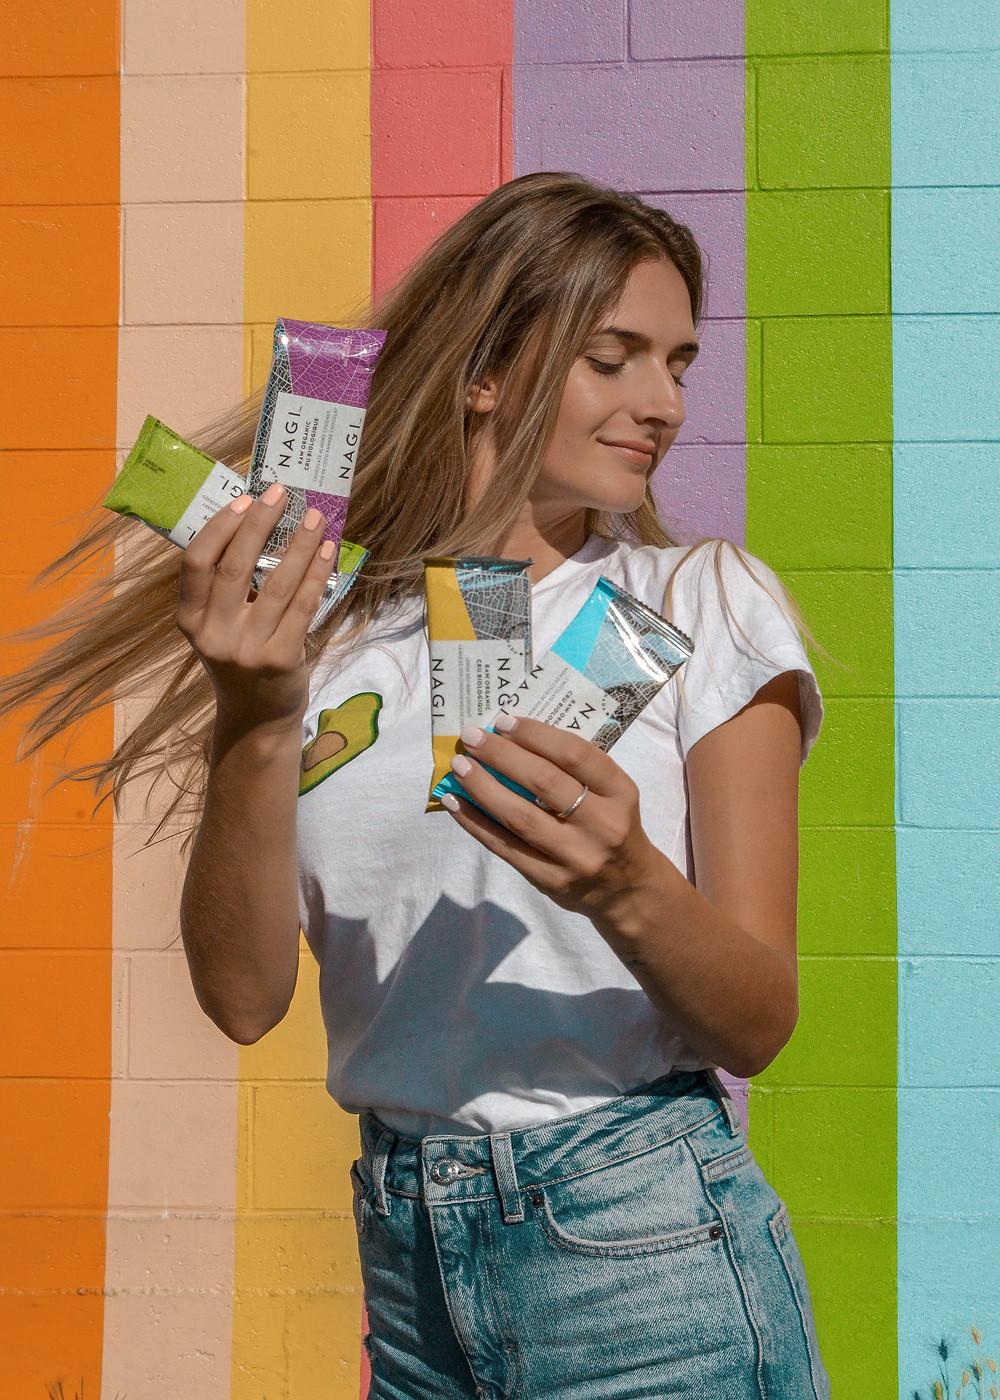 Nagi organix raw energy bars breakfast snack healthy living content creator